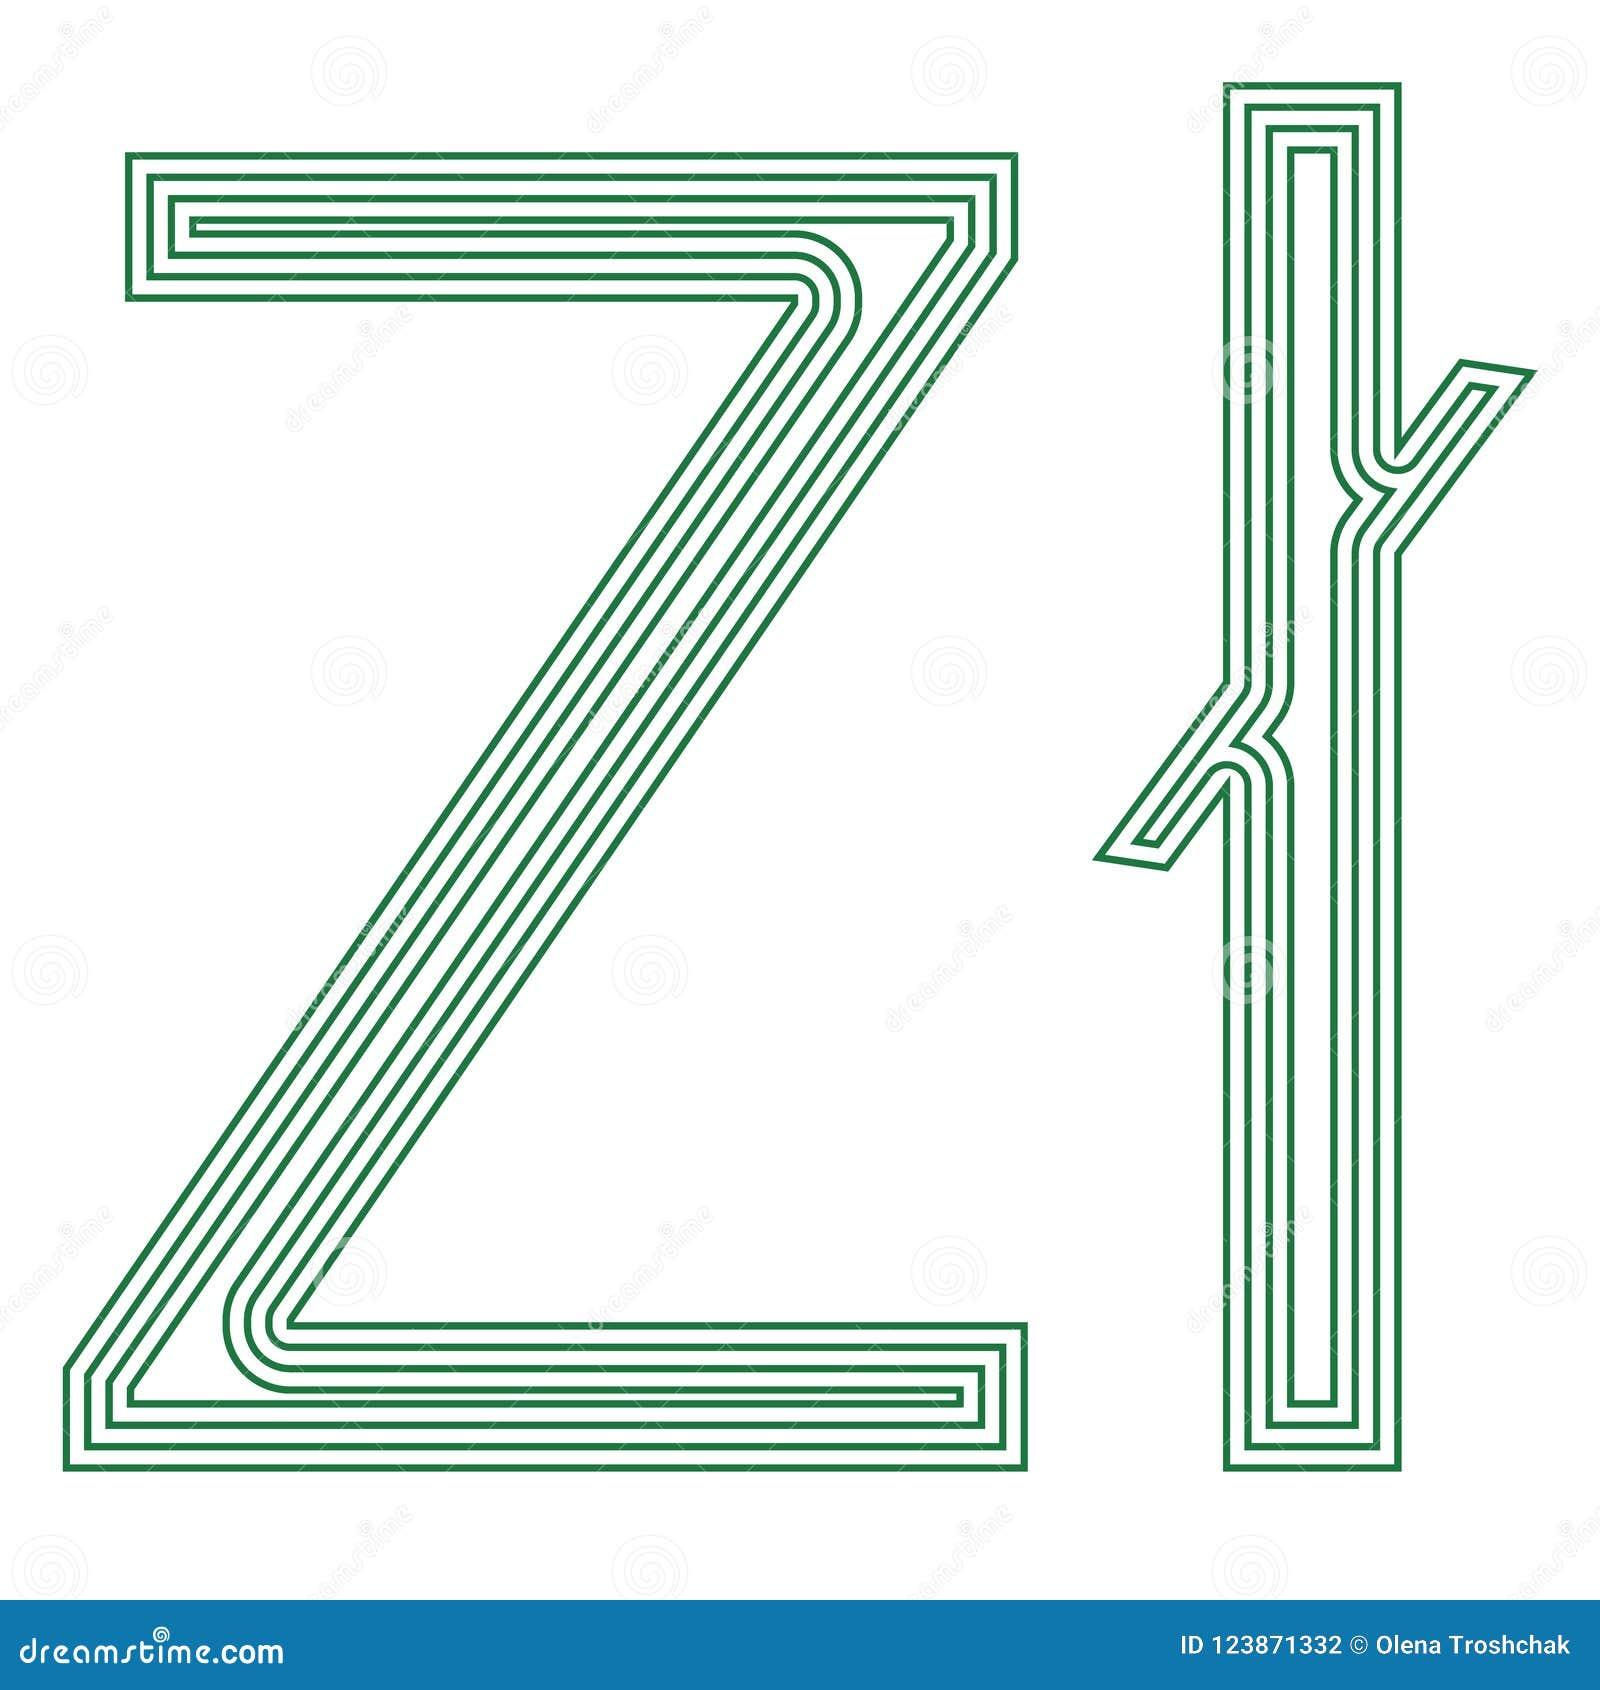 Zloty Polish Symbol Currency Unit Icon Striped Vector Illustration